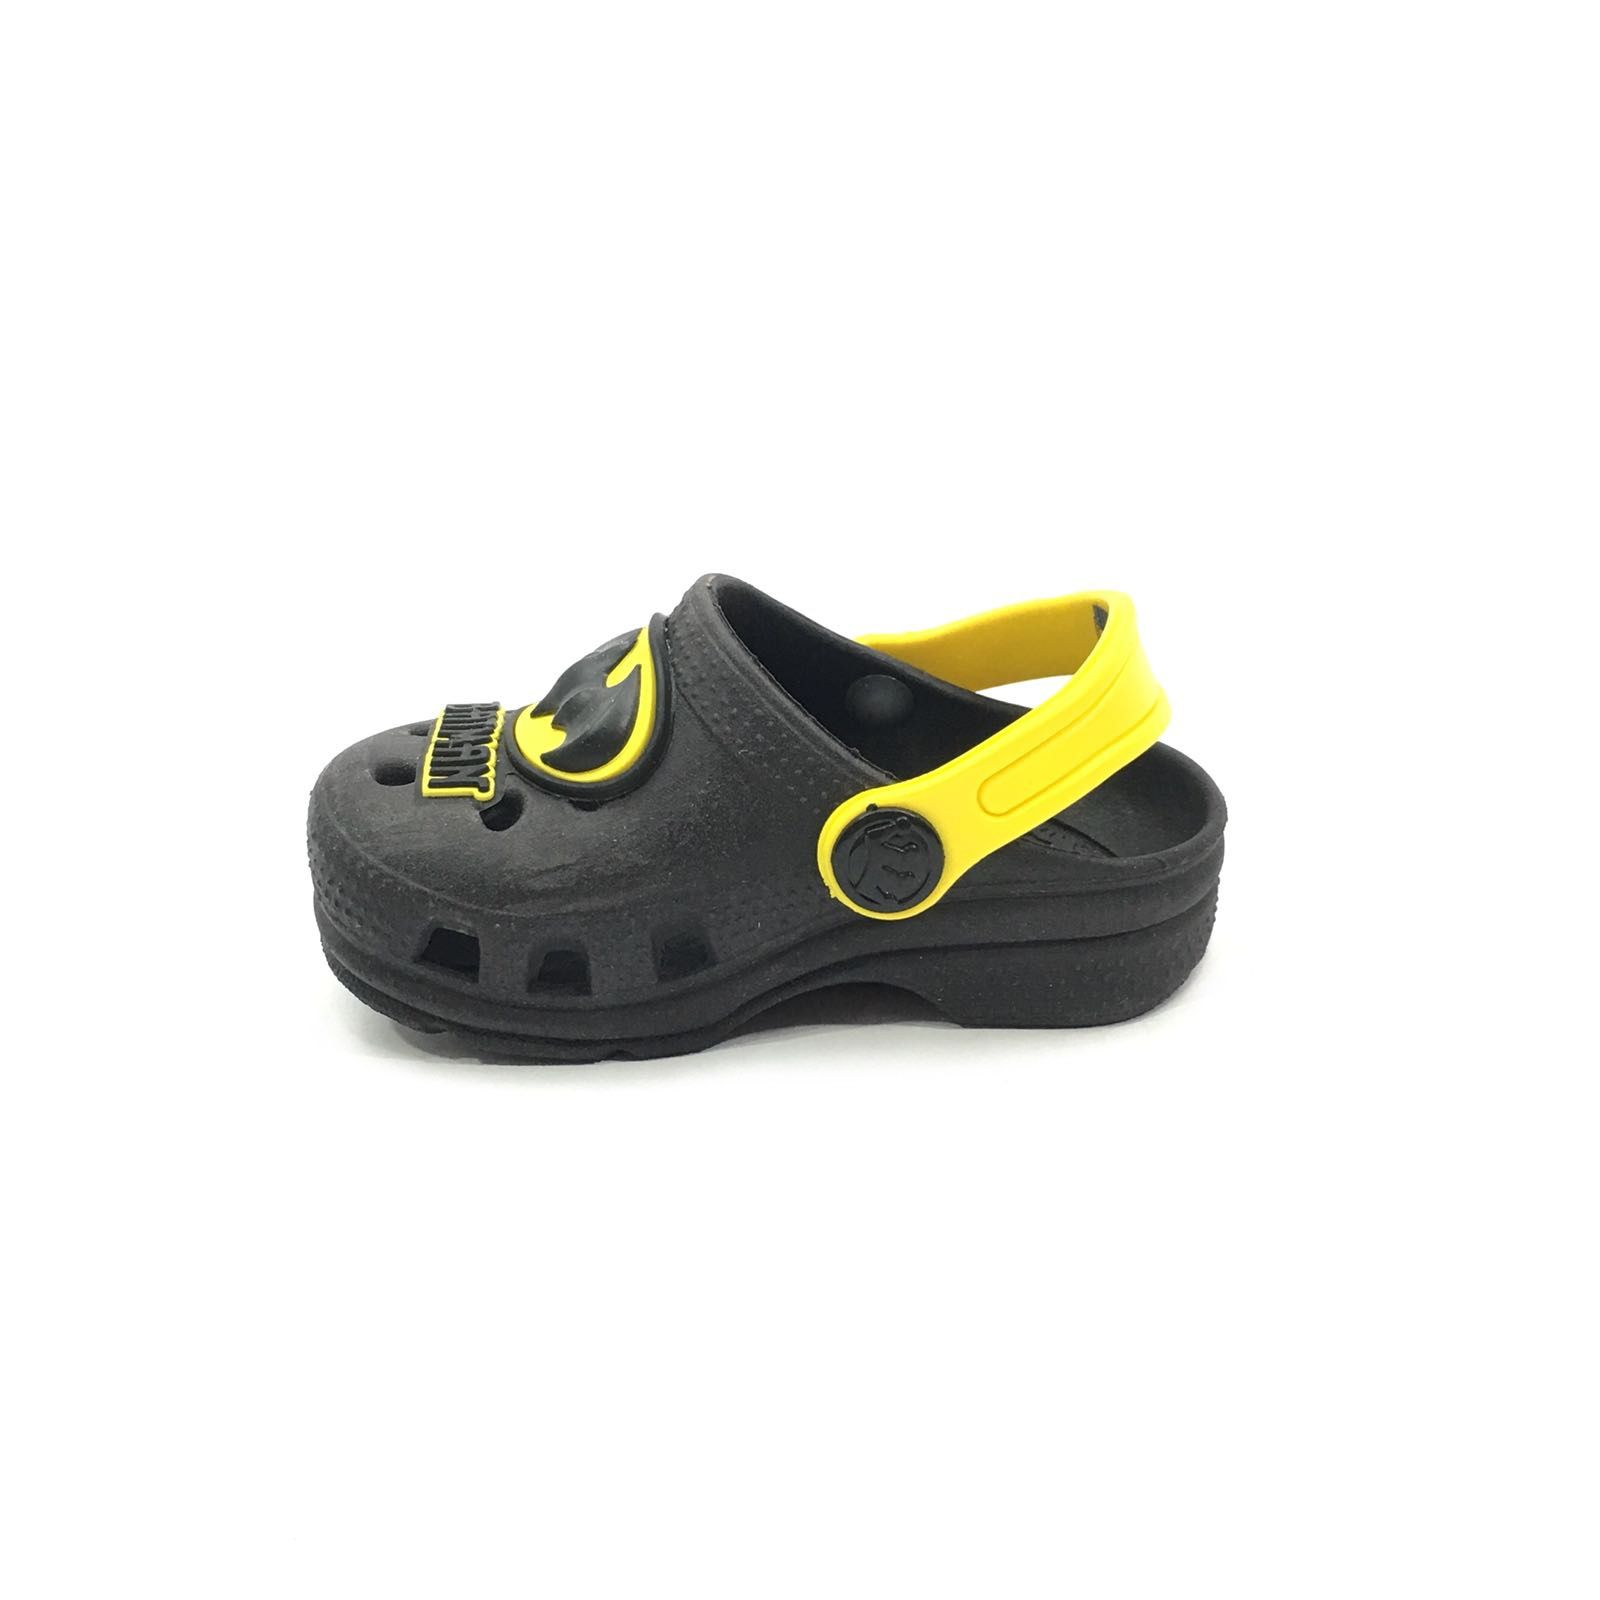 770907354e sandalia crocs infantil preto batman babuche Masculino Plugt